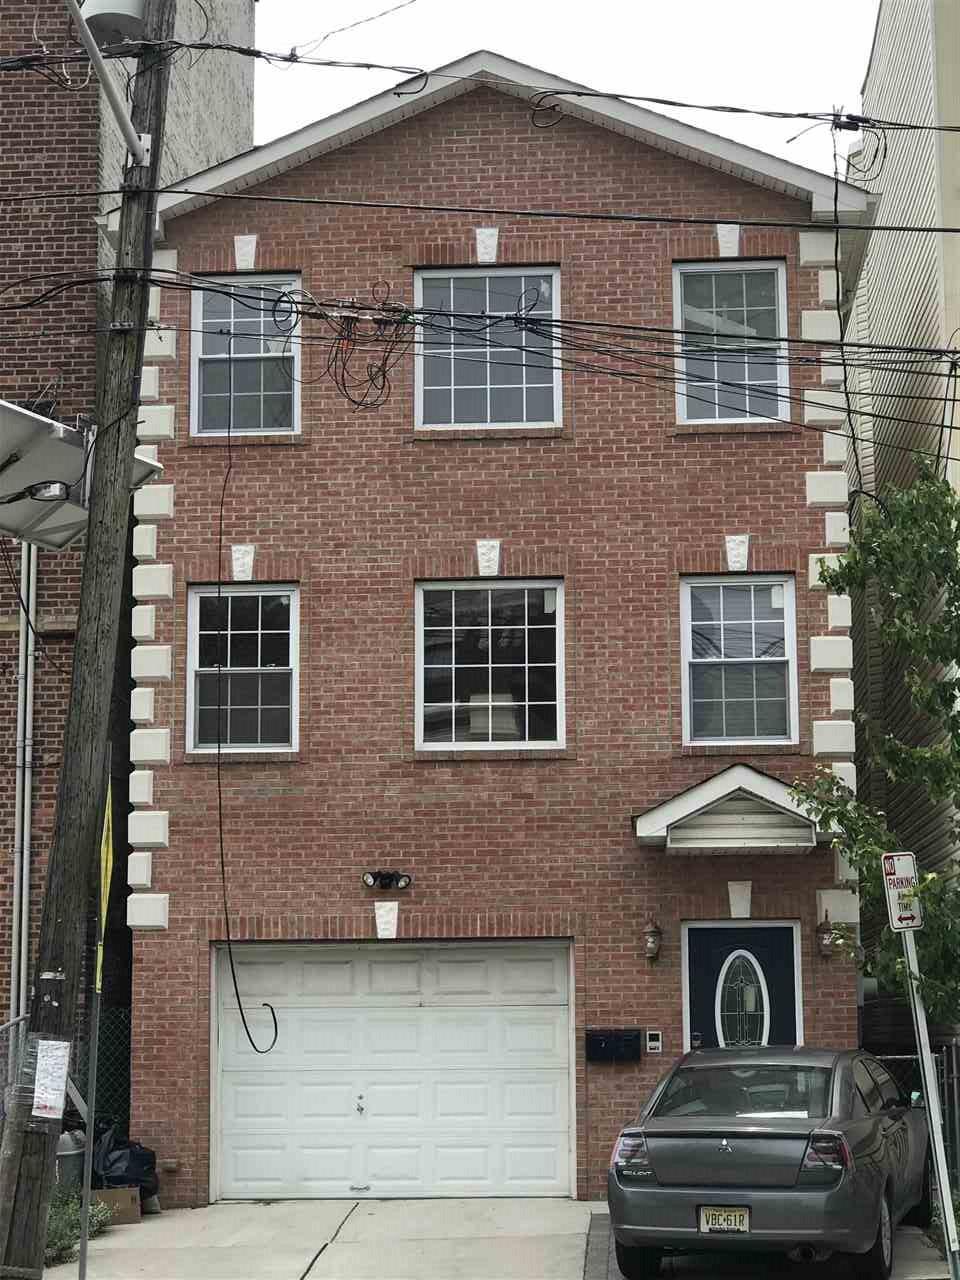 13 RAVINE AVE, JC, Heights, NJ 07307